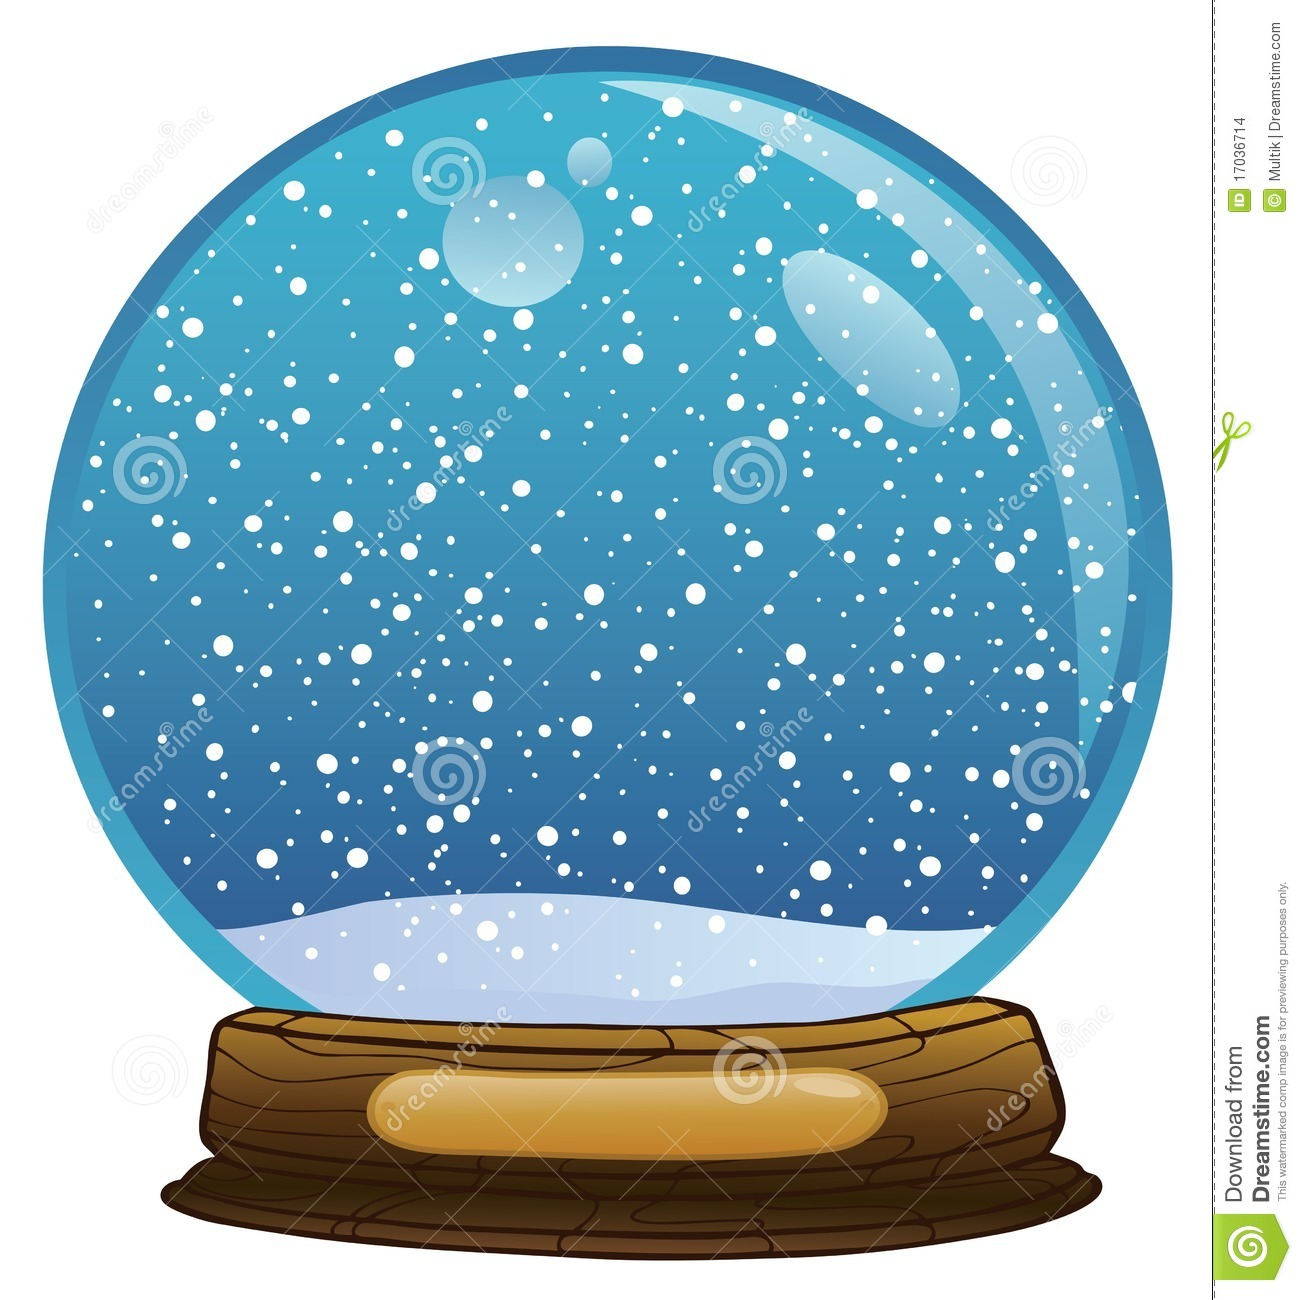 Empty snow globe clipart.